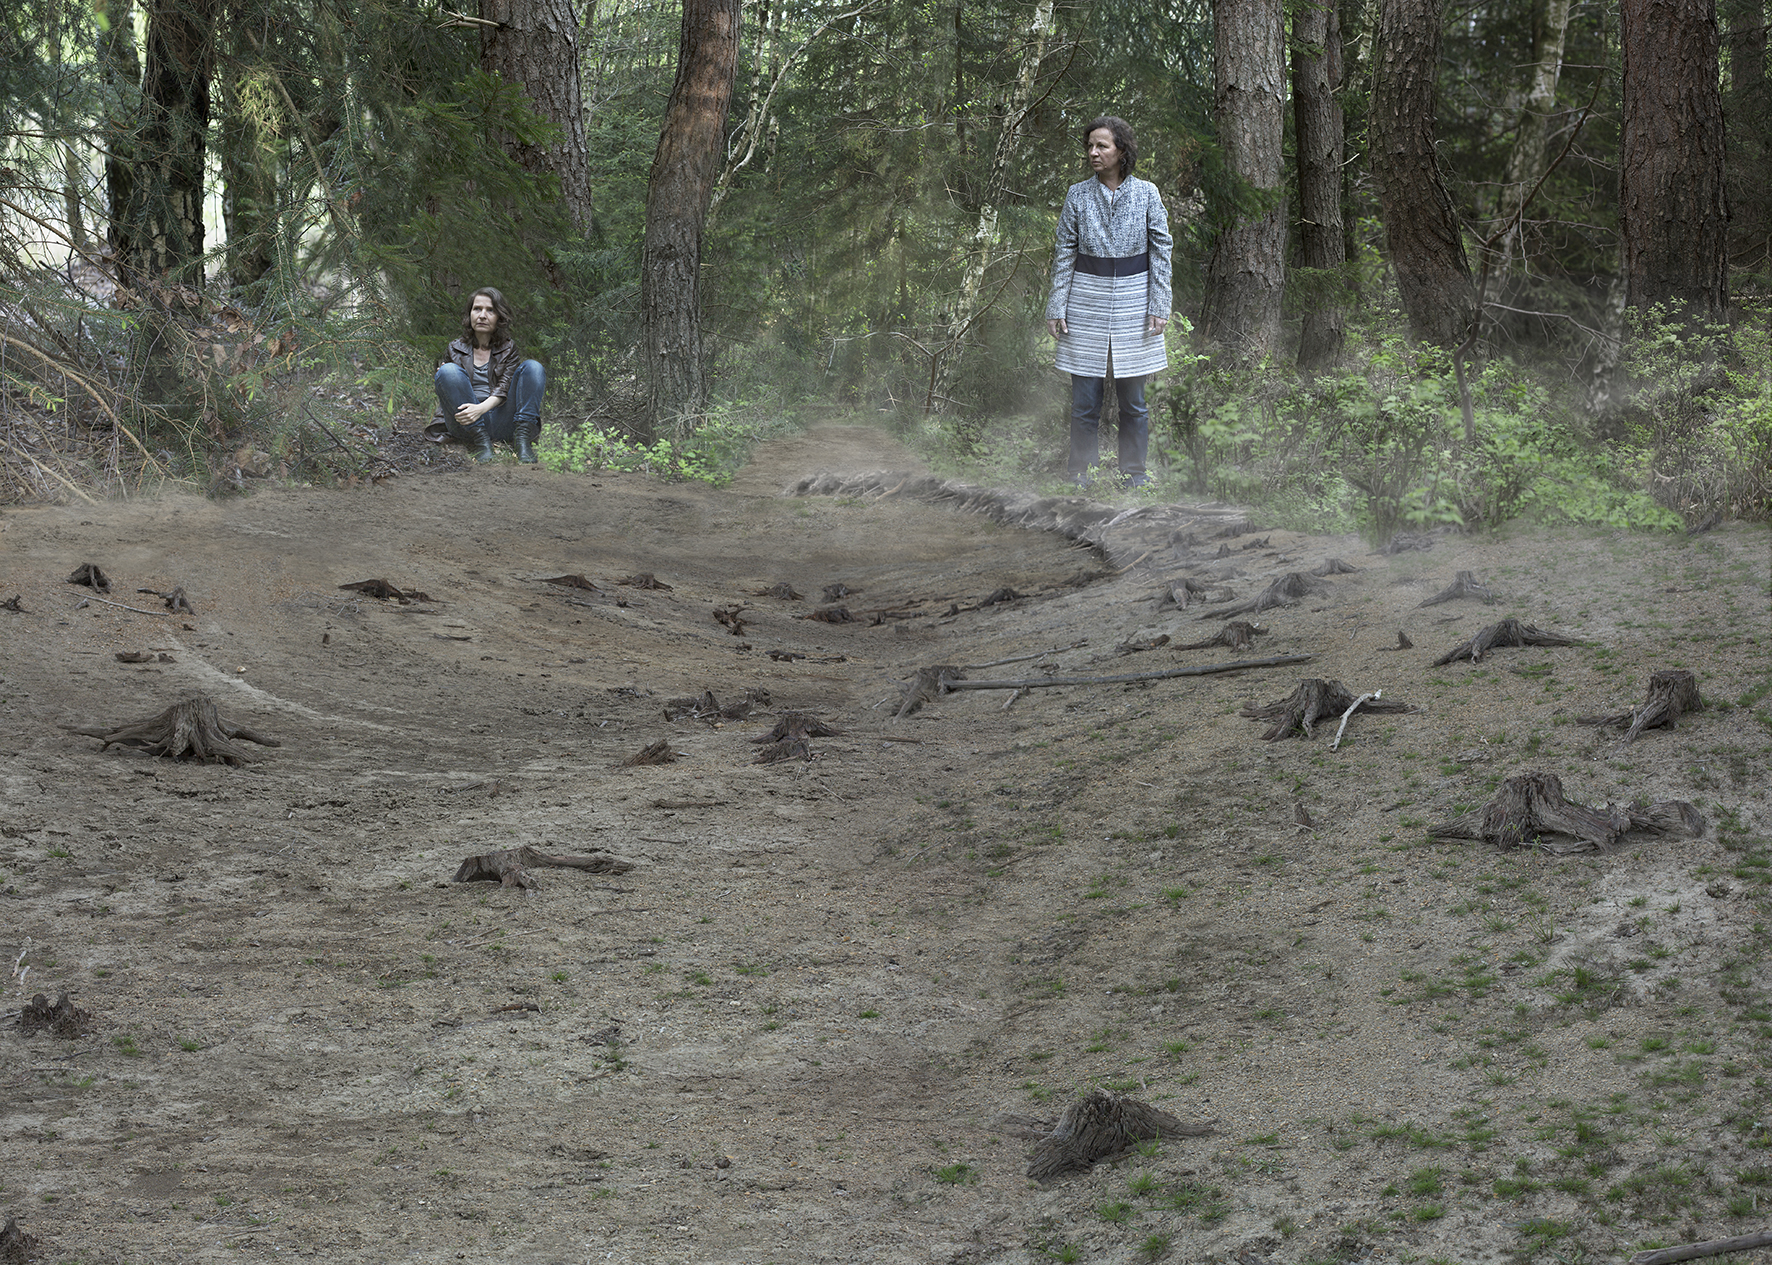 Flussbett©Joanna Vortmann 2014